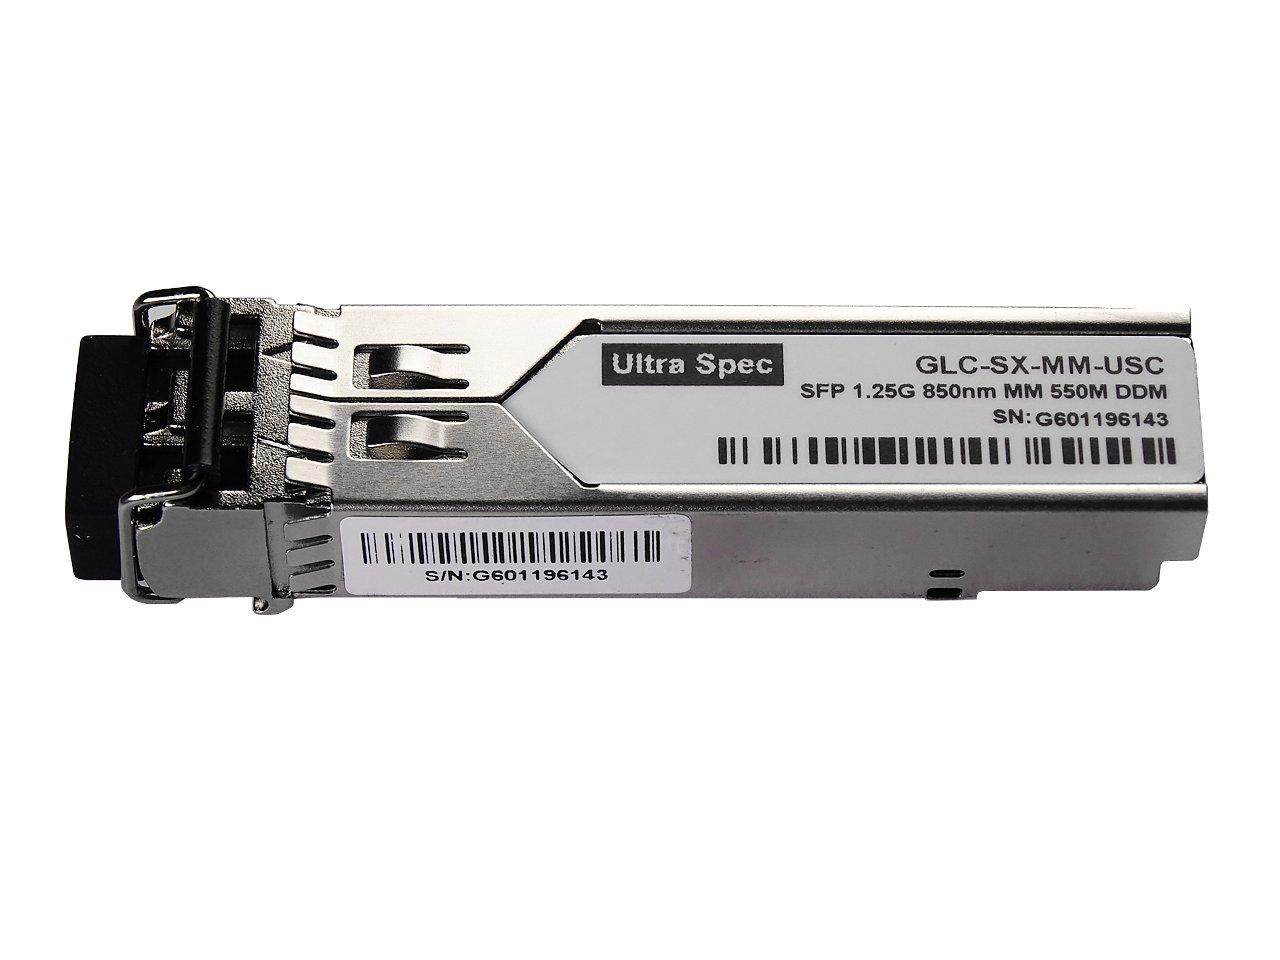 GLC-SX-MM-USC 1000Base-SX SFP Fiber LC Mini-GBIC Ultra Spec Cables